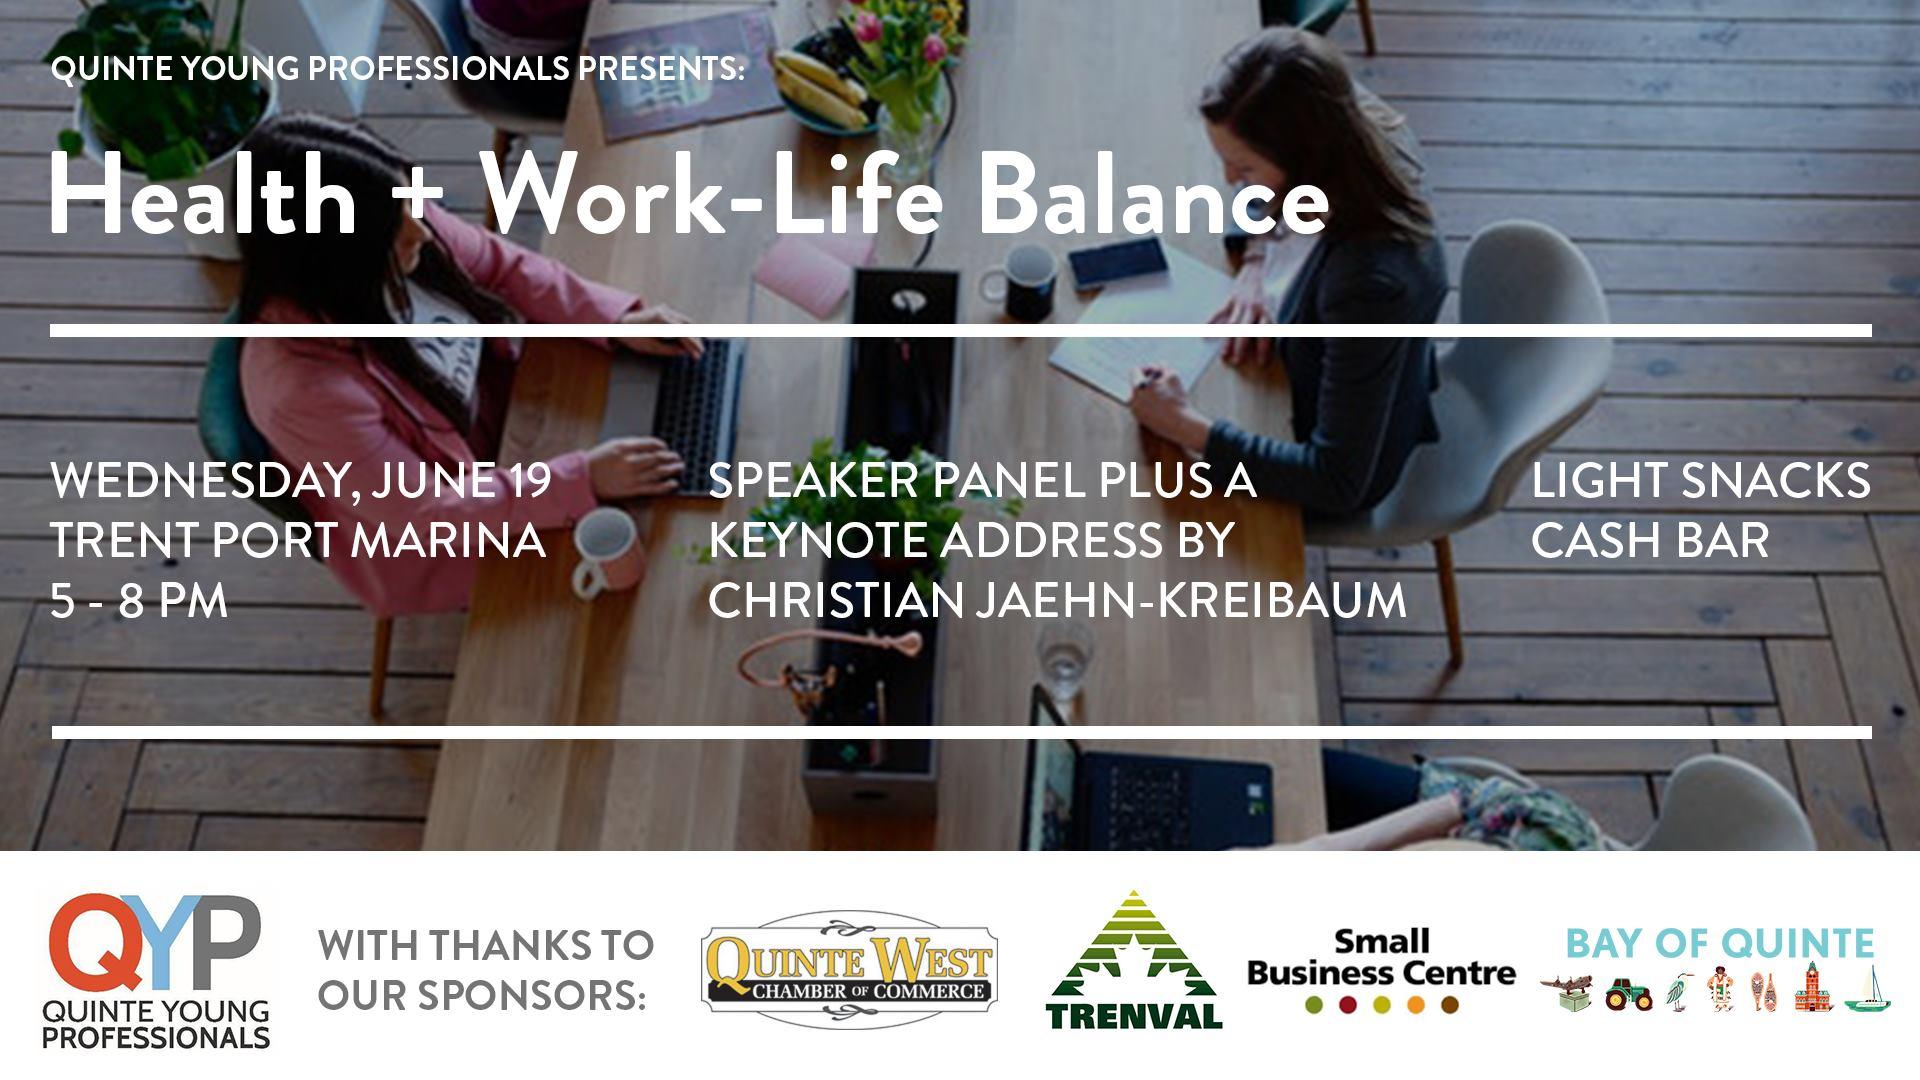 Health + Work-Life Balance flyer